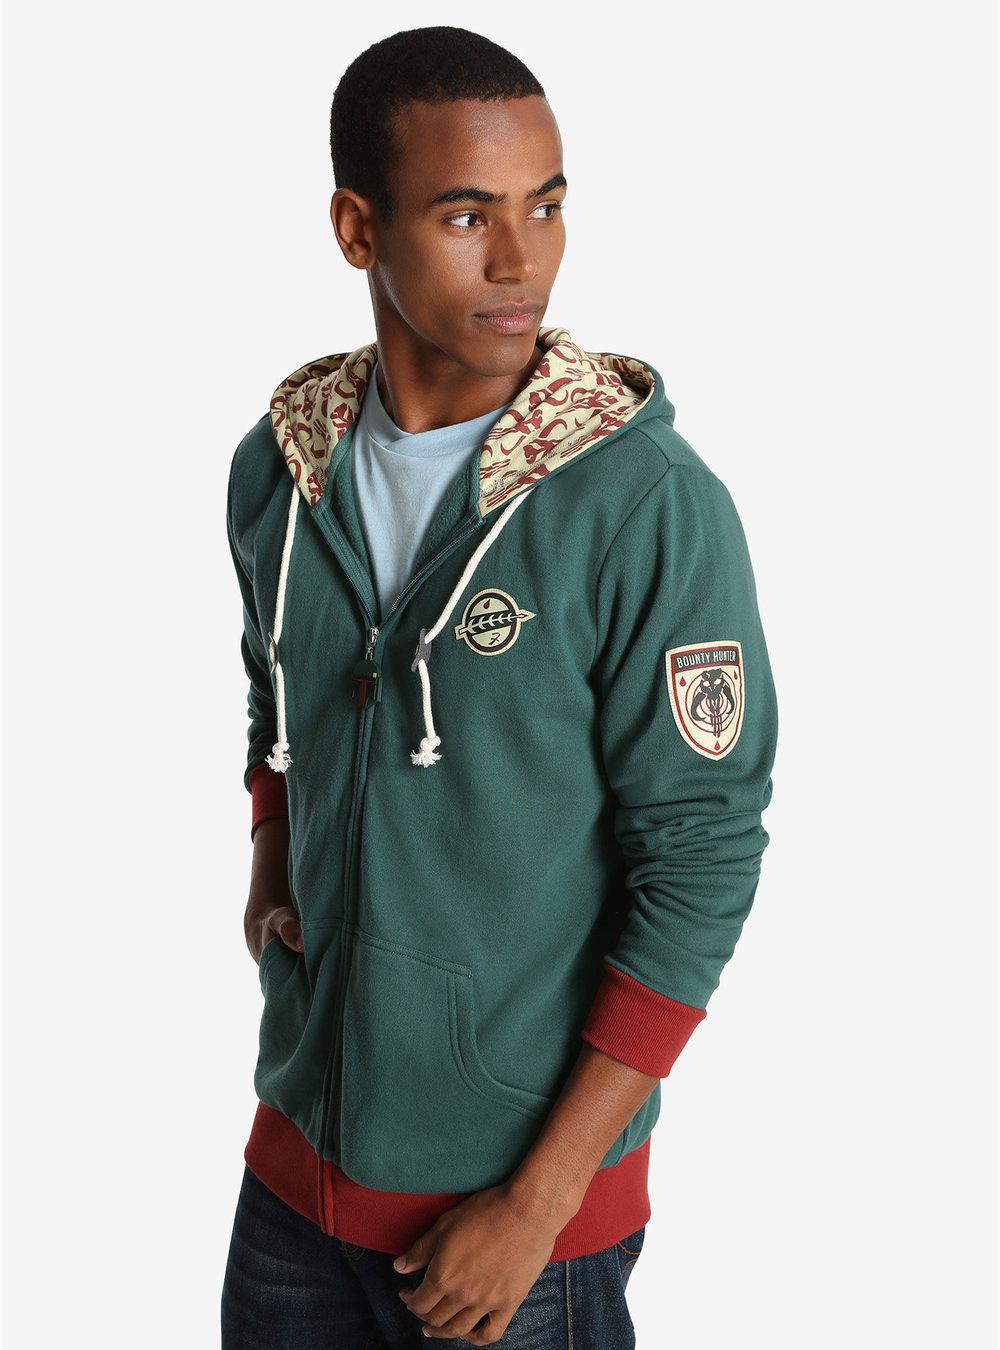 boba fett patch hoodie.jpg